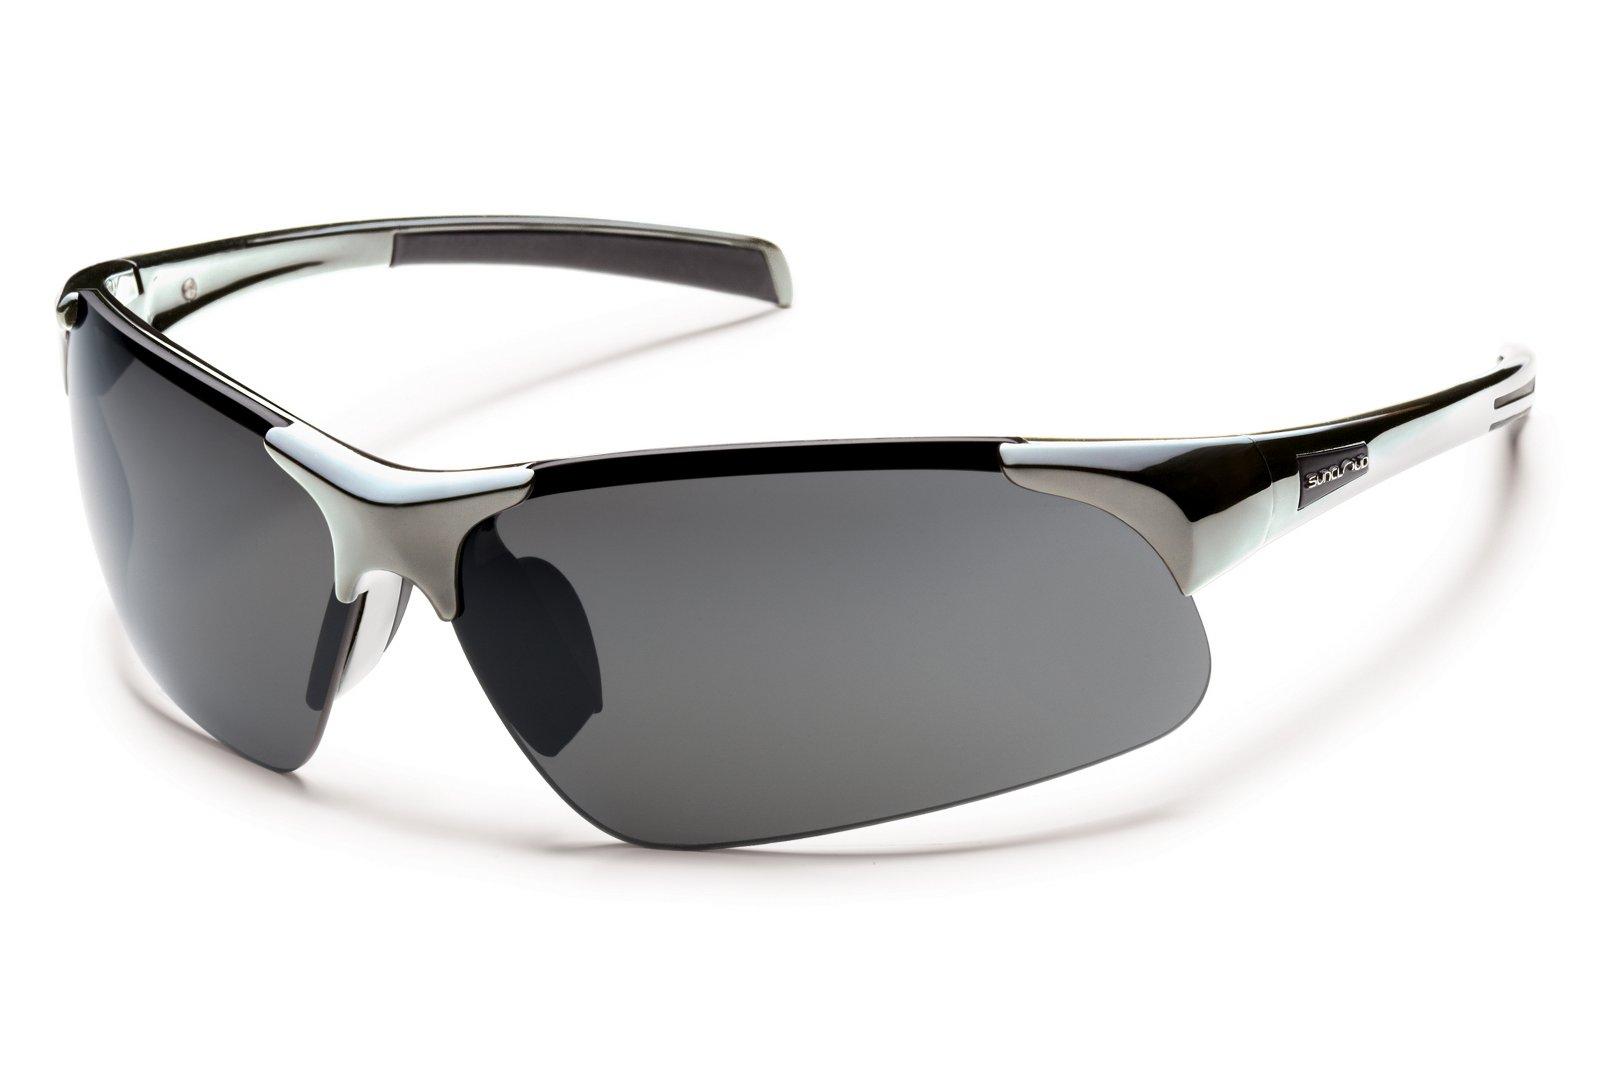 9a103474093a Suncloud Cutout Sunglasses Reviews - Bitterroot Public Library